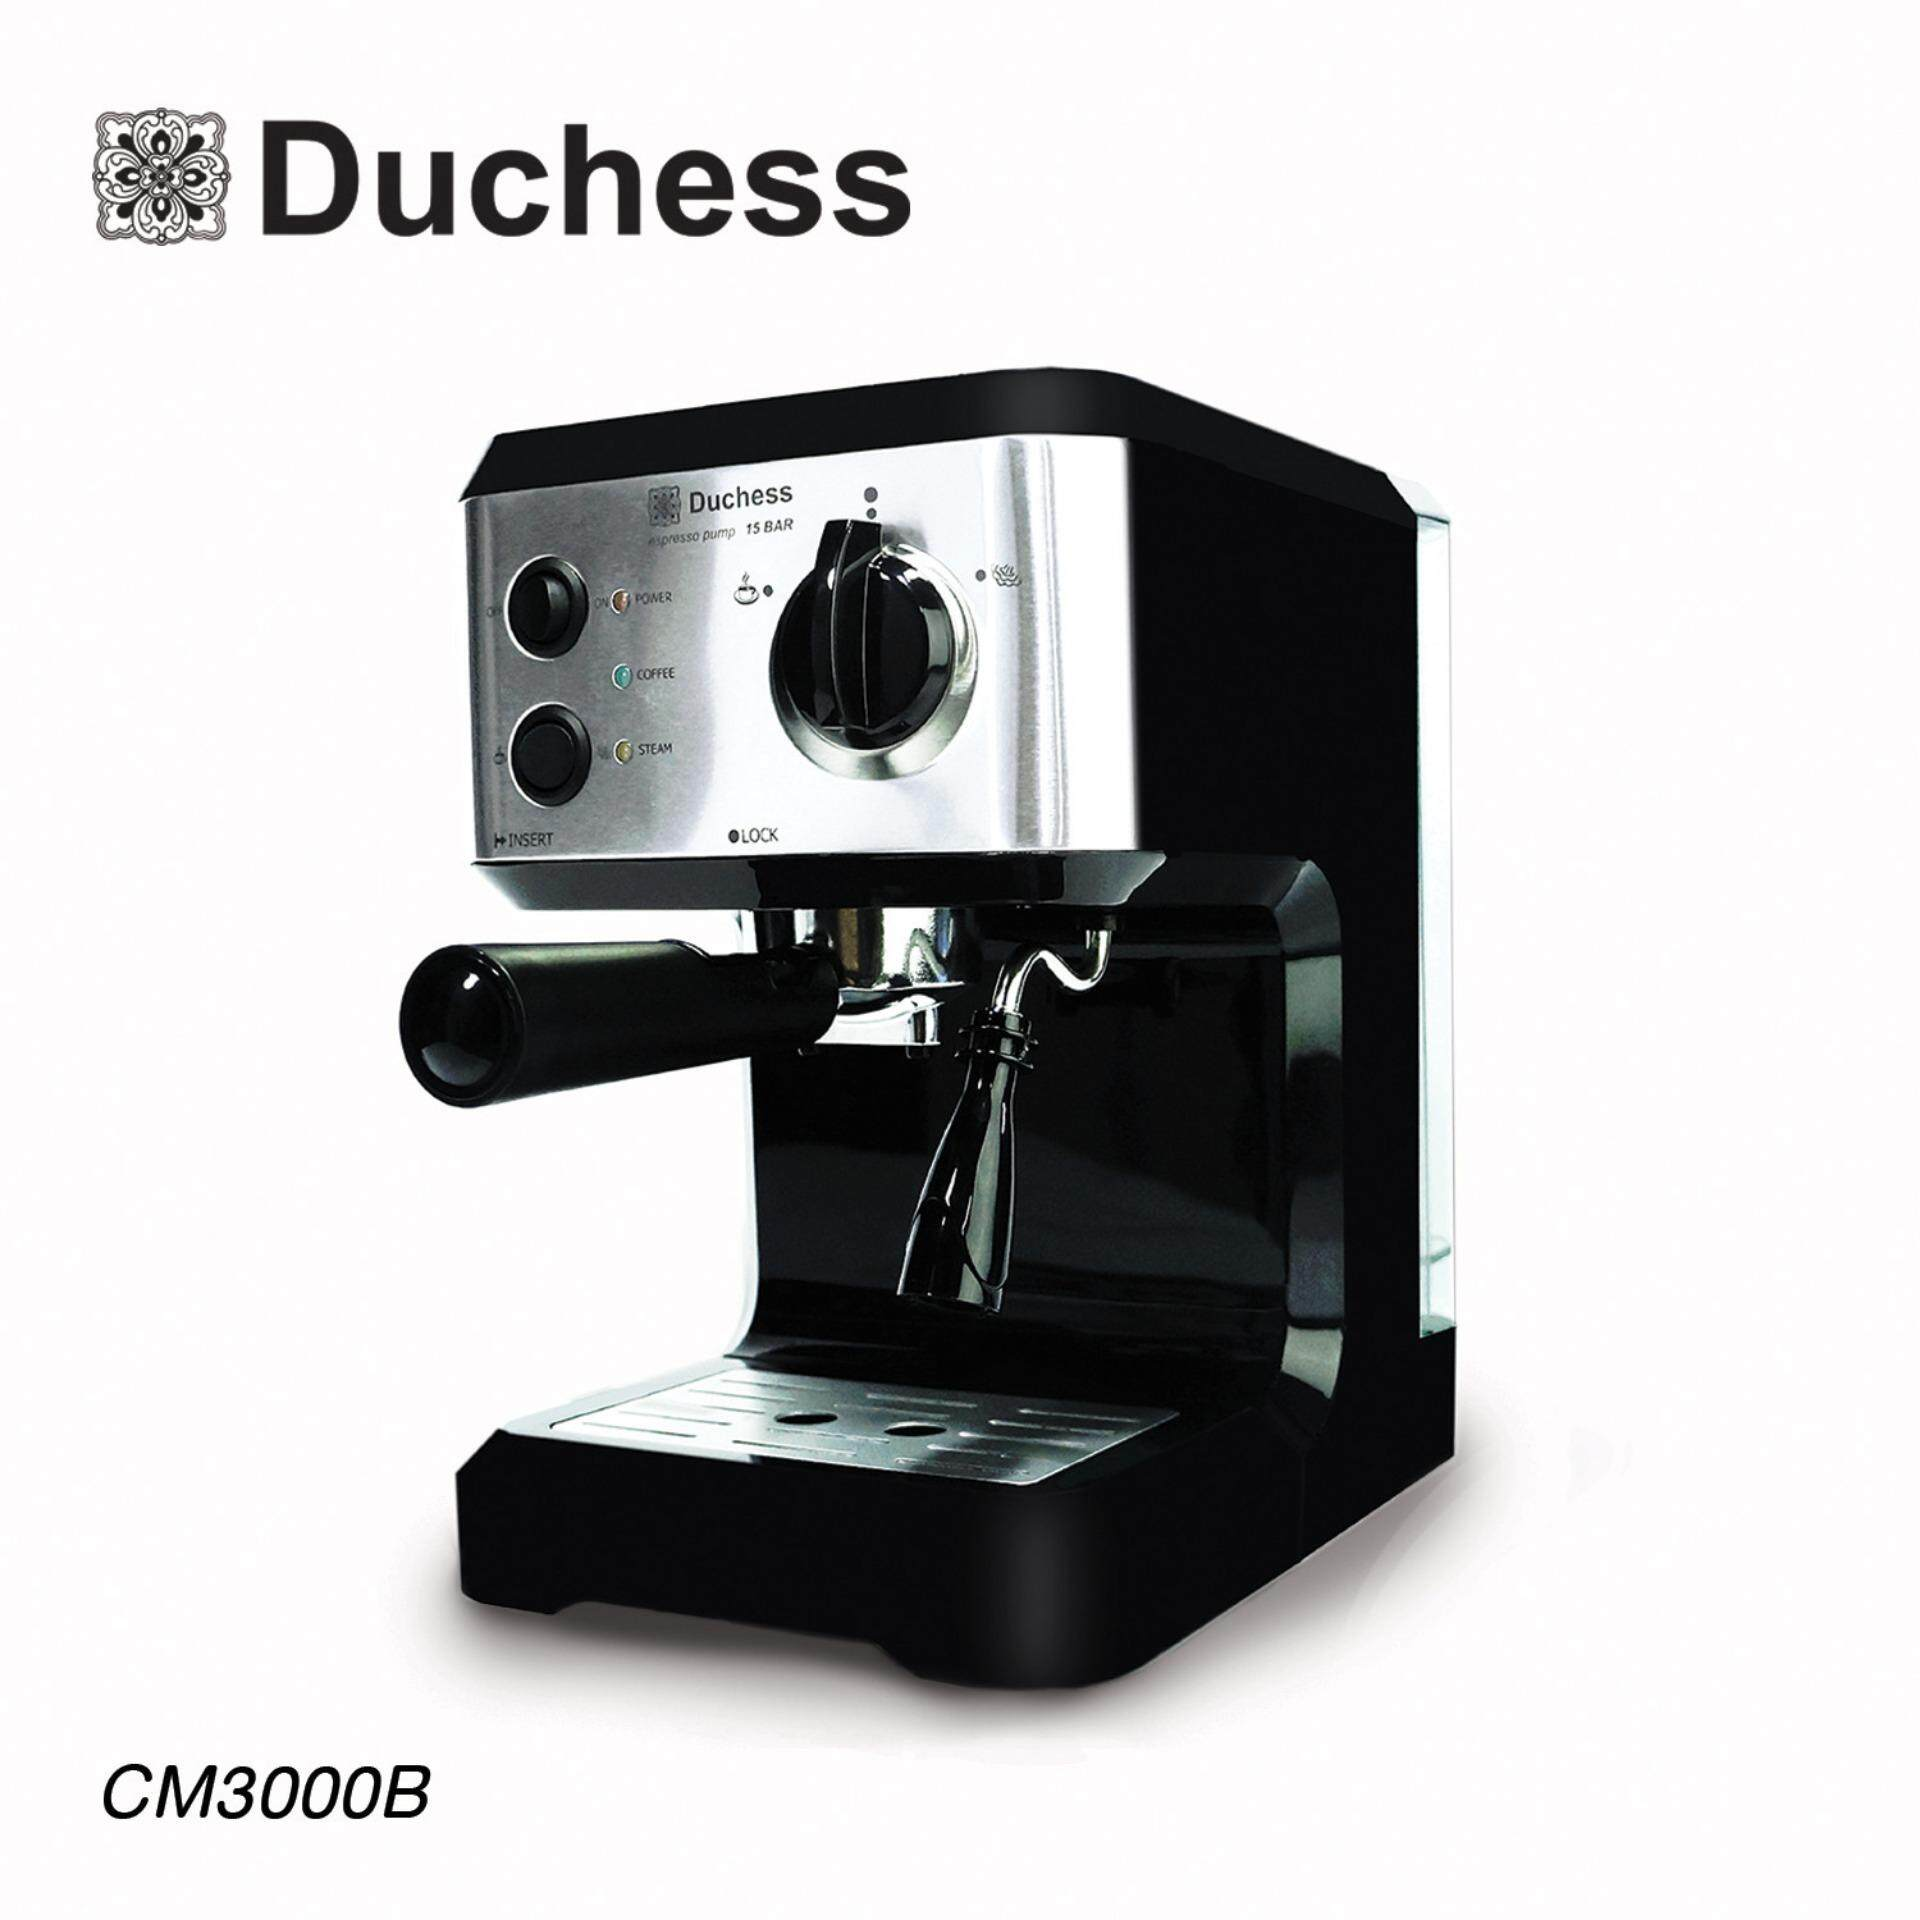 Duchess เครื่องชงกาแฟสด รุ่น Cm3000b By Outlet108.